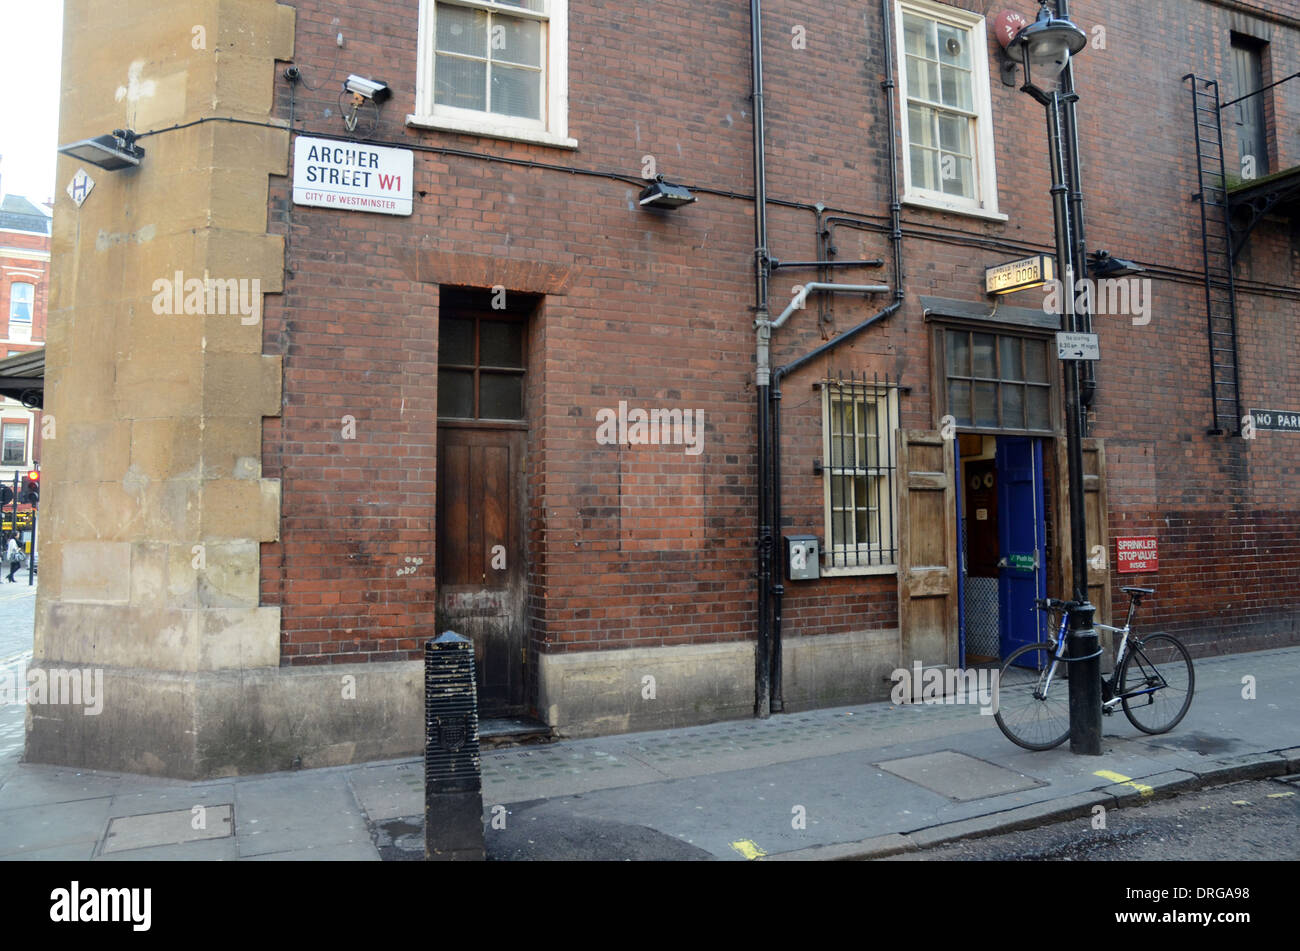 Apollo theatre stage door Shaftesbury Avenue London 21/01/2014 - Stock Image